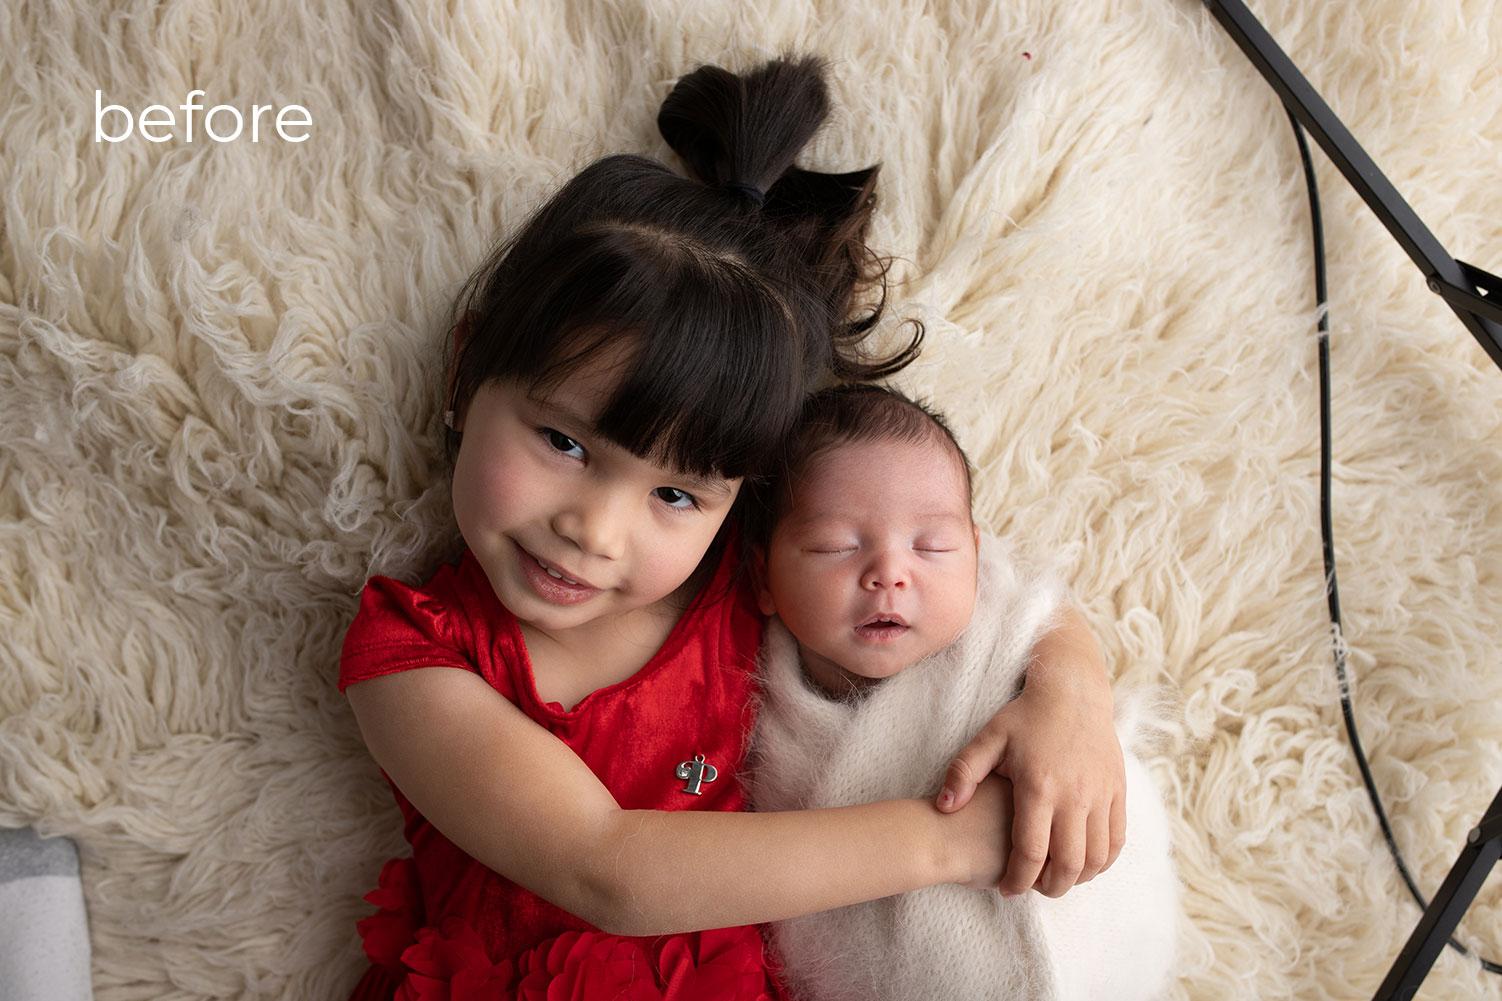 Newborn Photo Retouching Services before